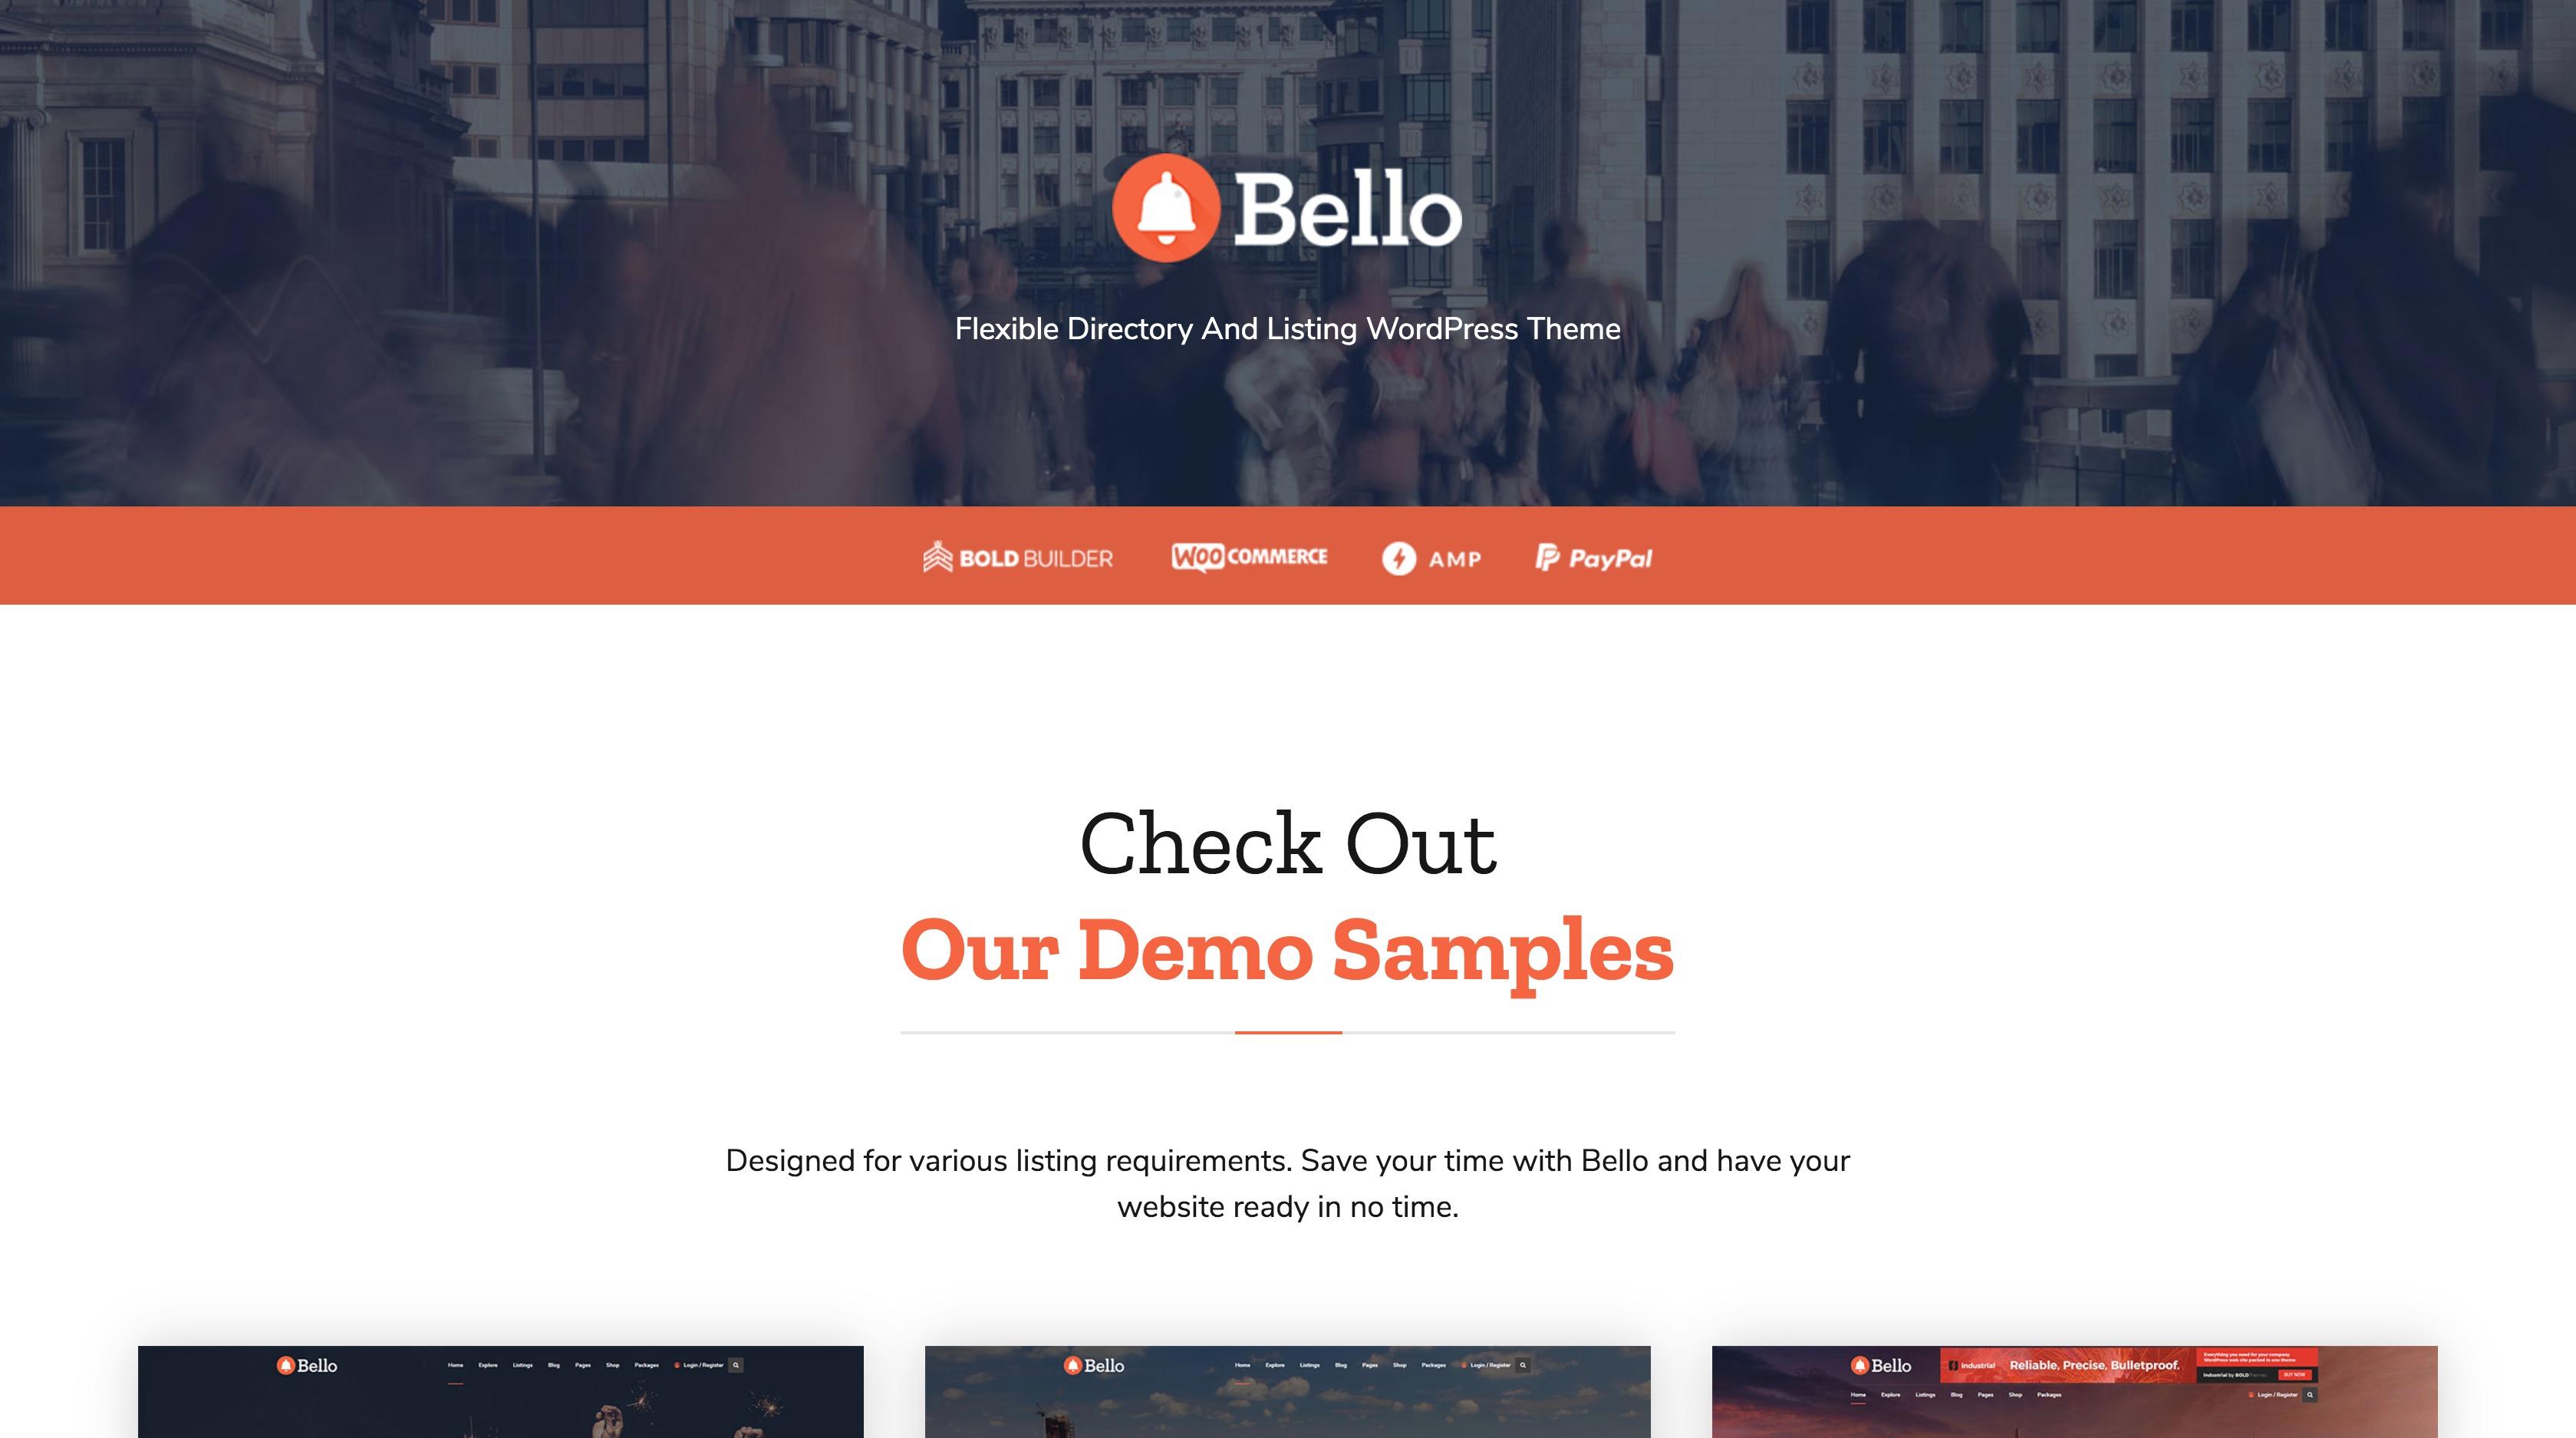 Bello-网红店点评打卡商家目录WordPress主题